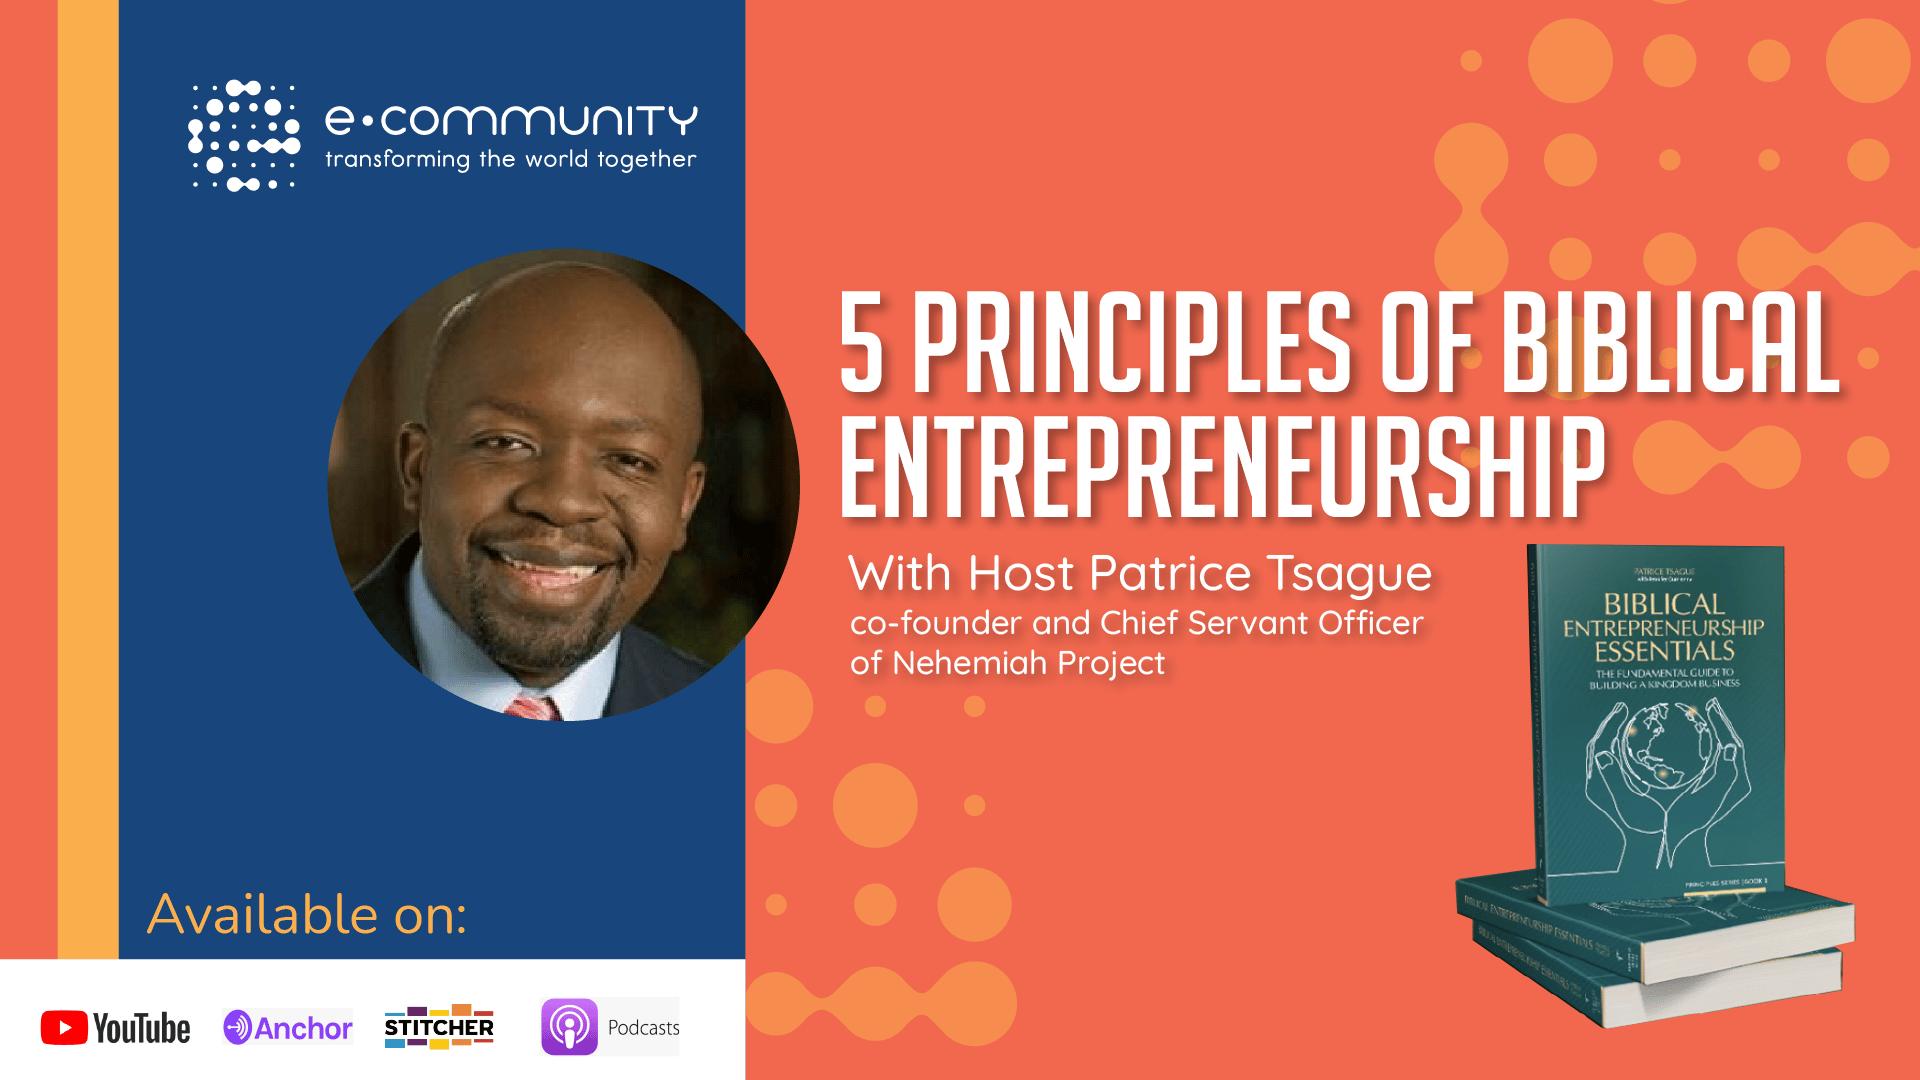 Five Principles of Biblical Entrepreneurship